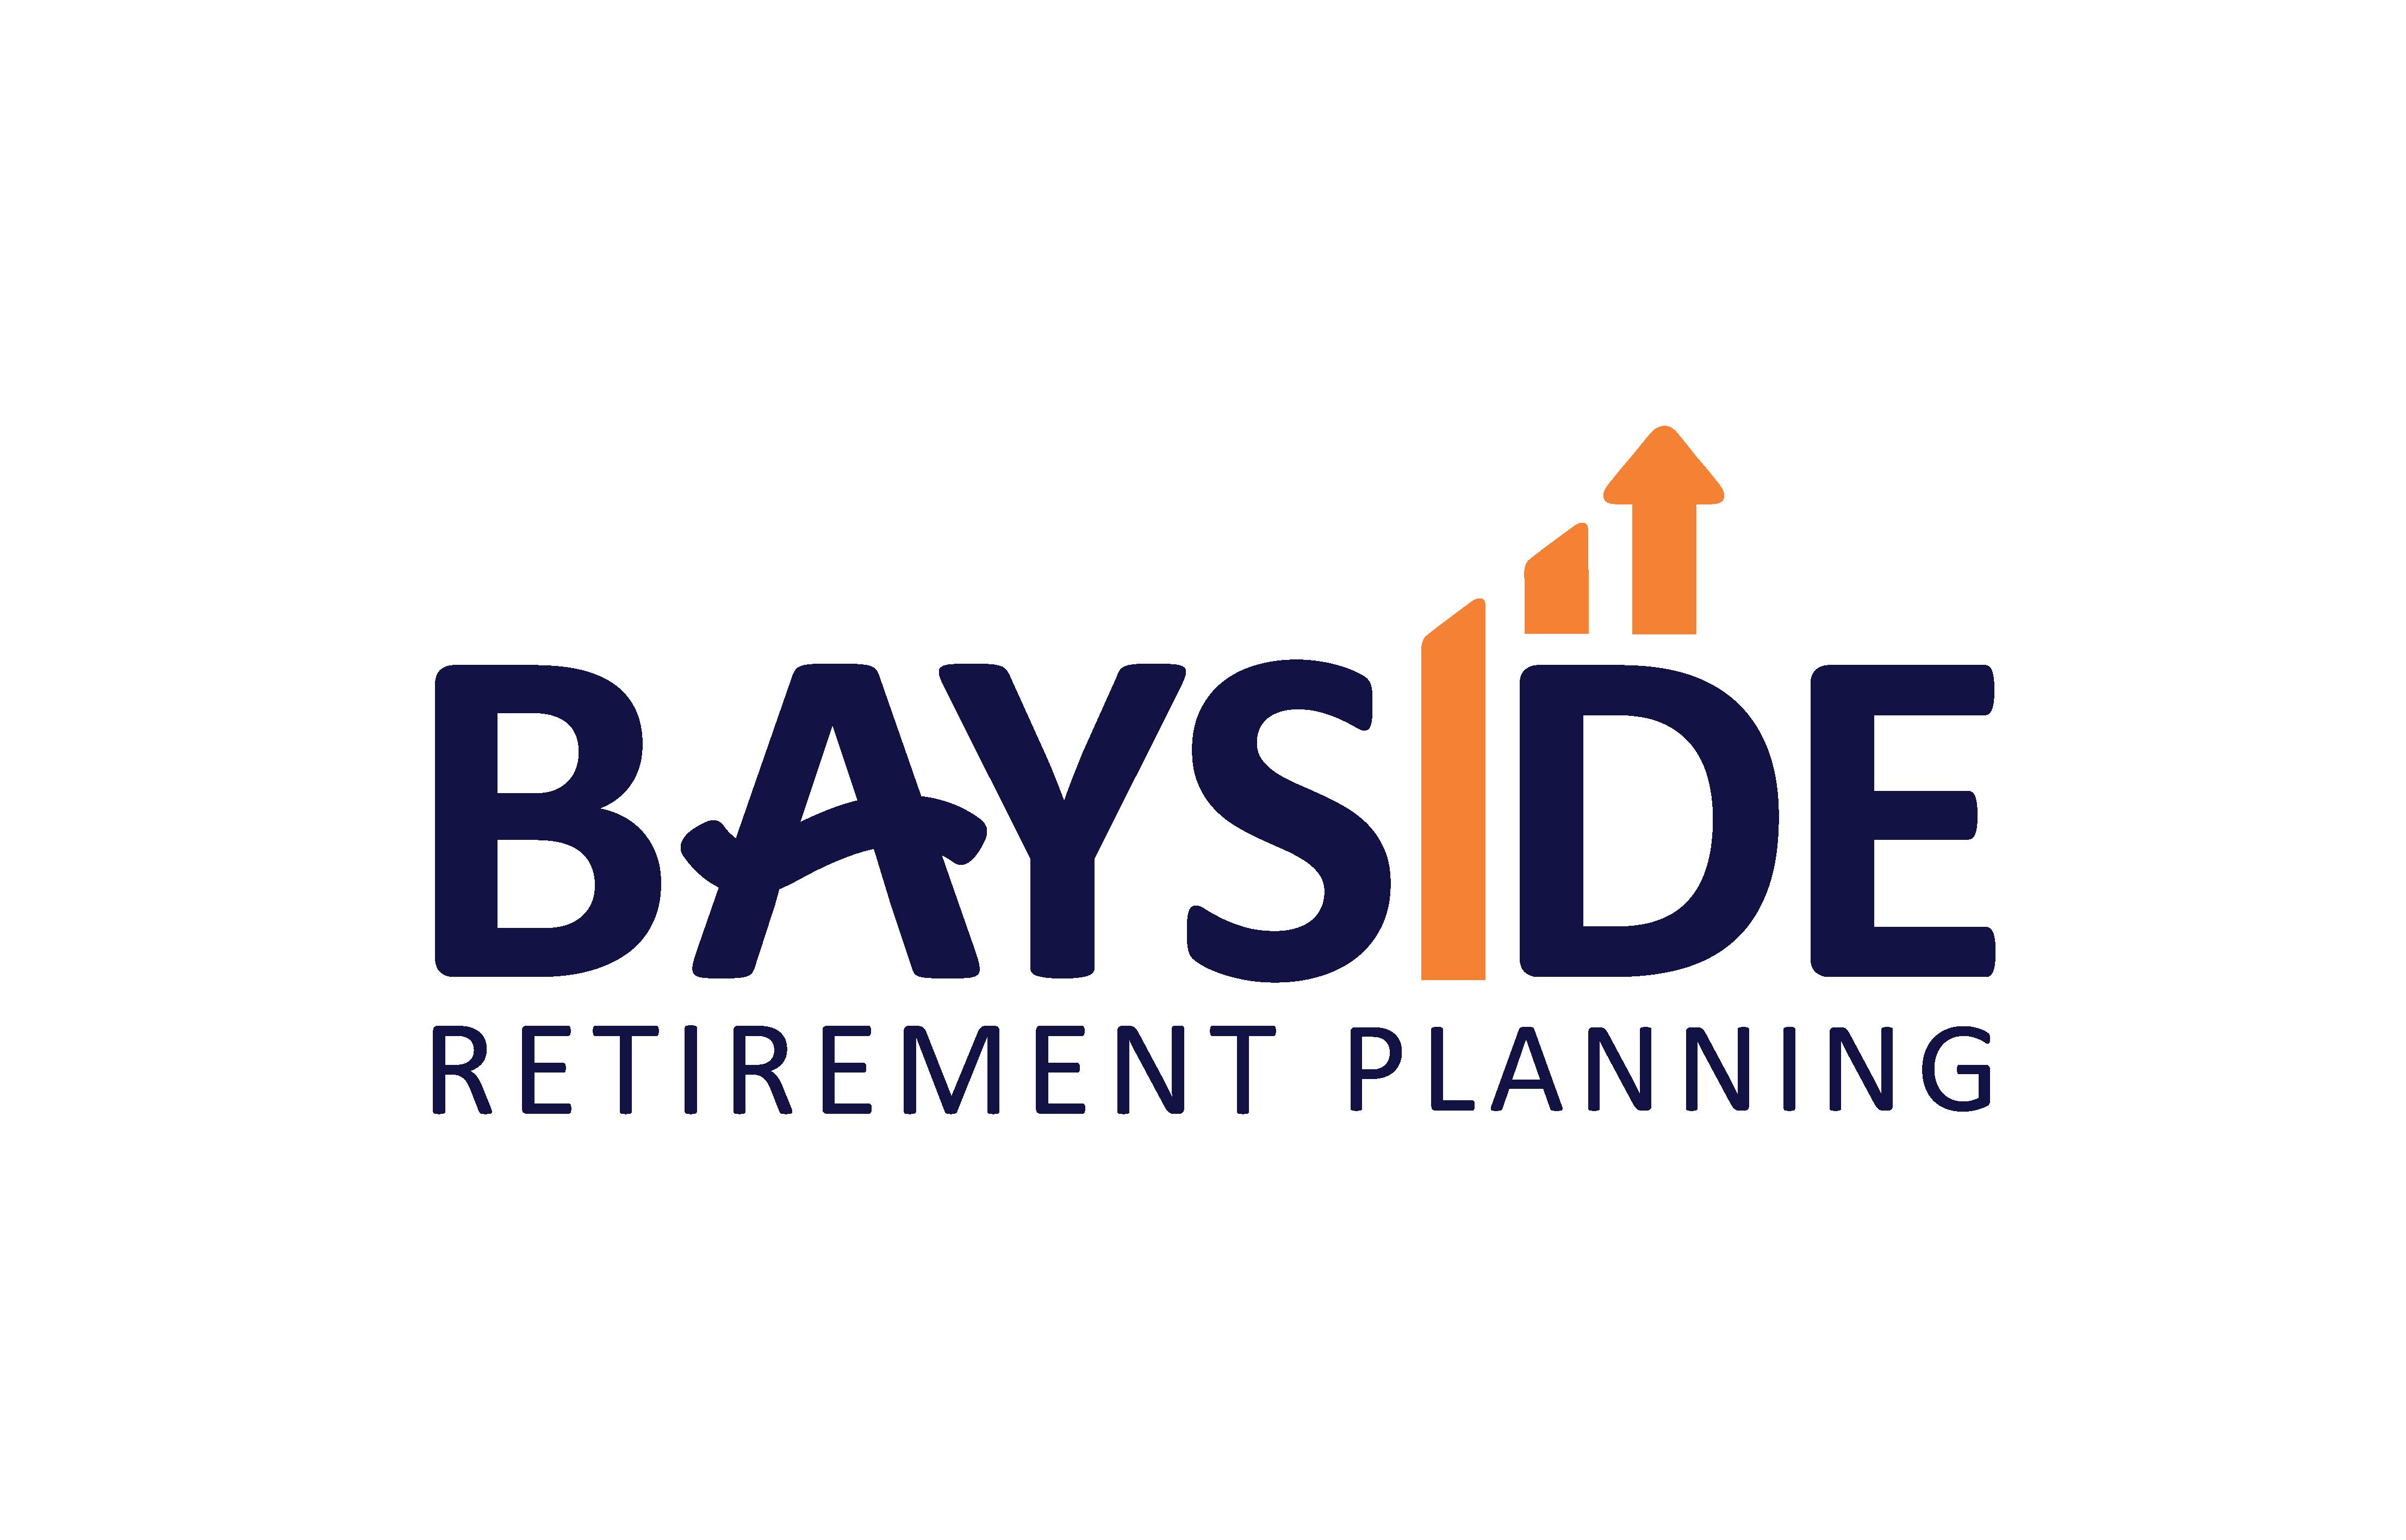 Bayside Retirement Planning